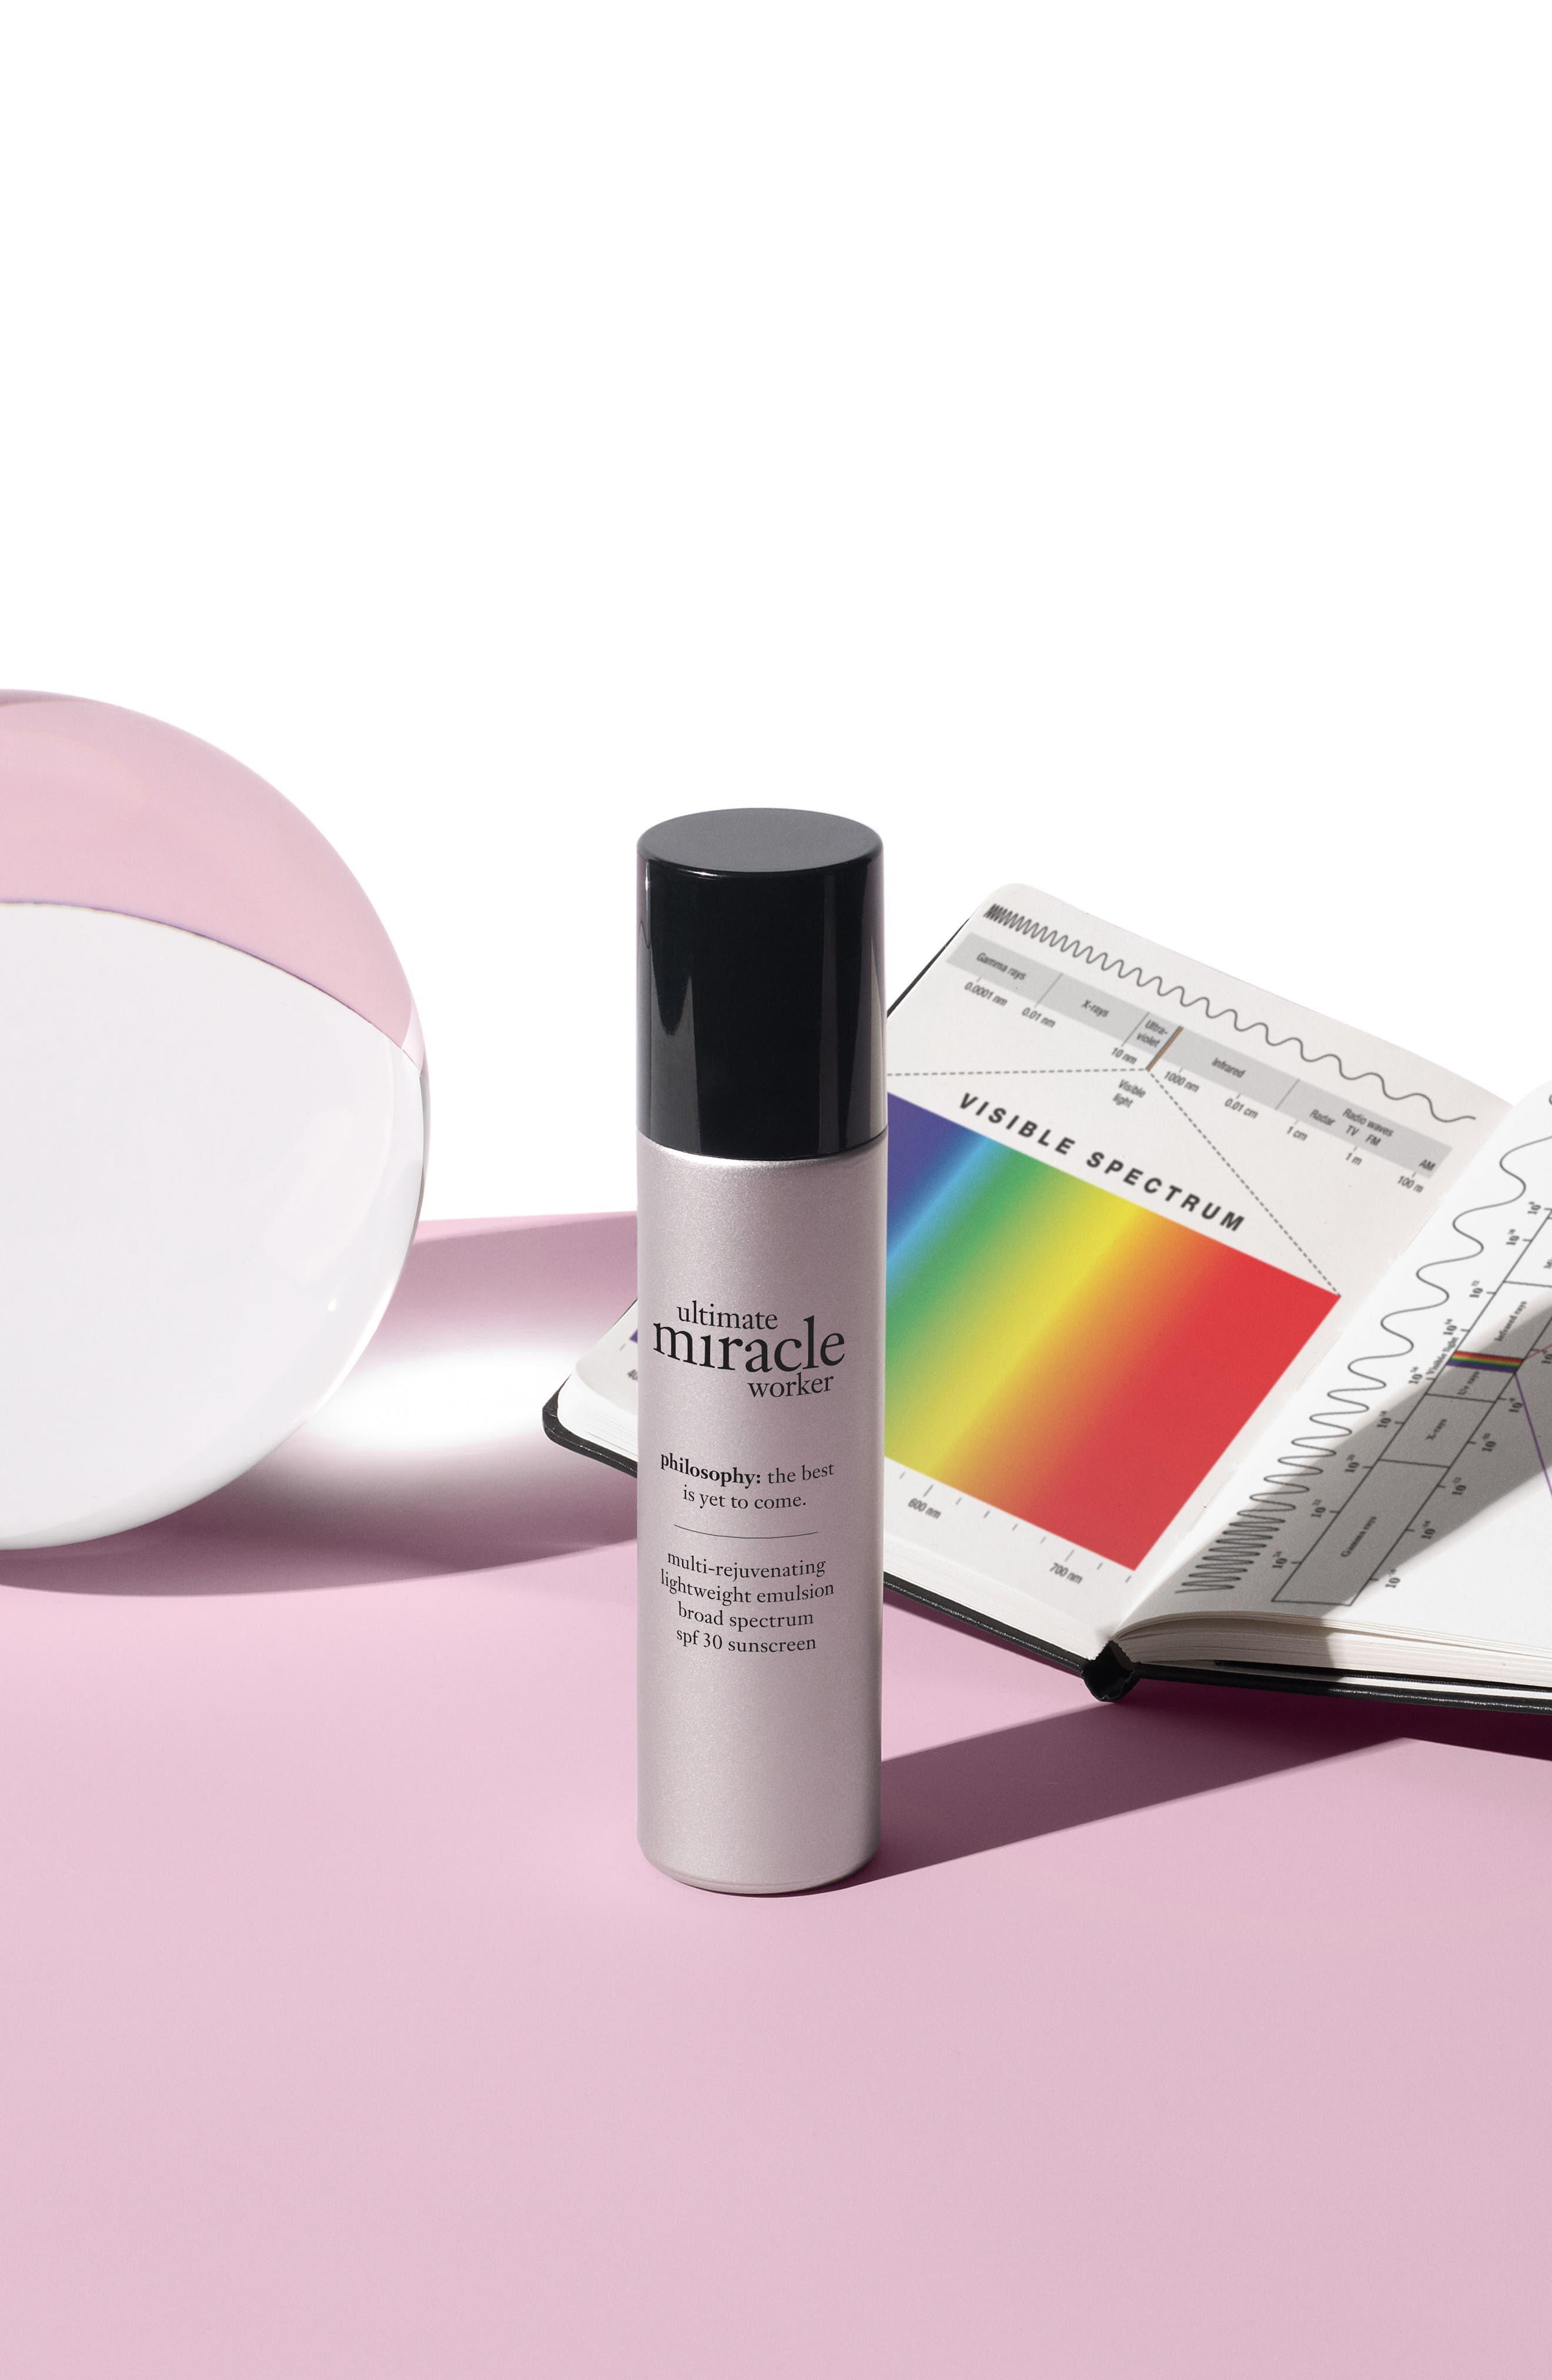 'ultimate miracle worker' multi-rejuvenating lightweight emulsion broad spectrum SPF 30 sunscreen,                             Alternate thumbnail 3, color,                             000